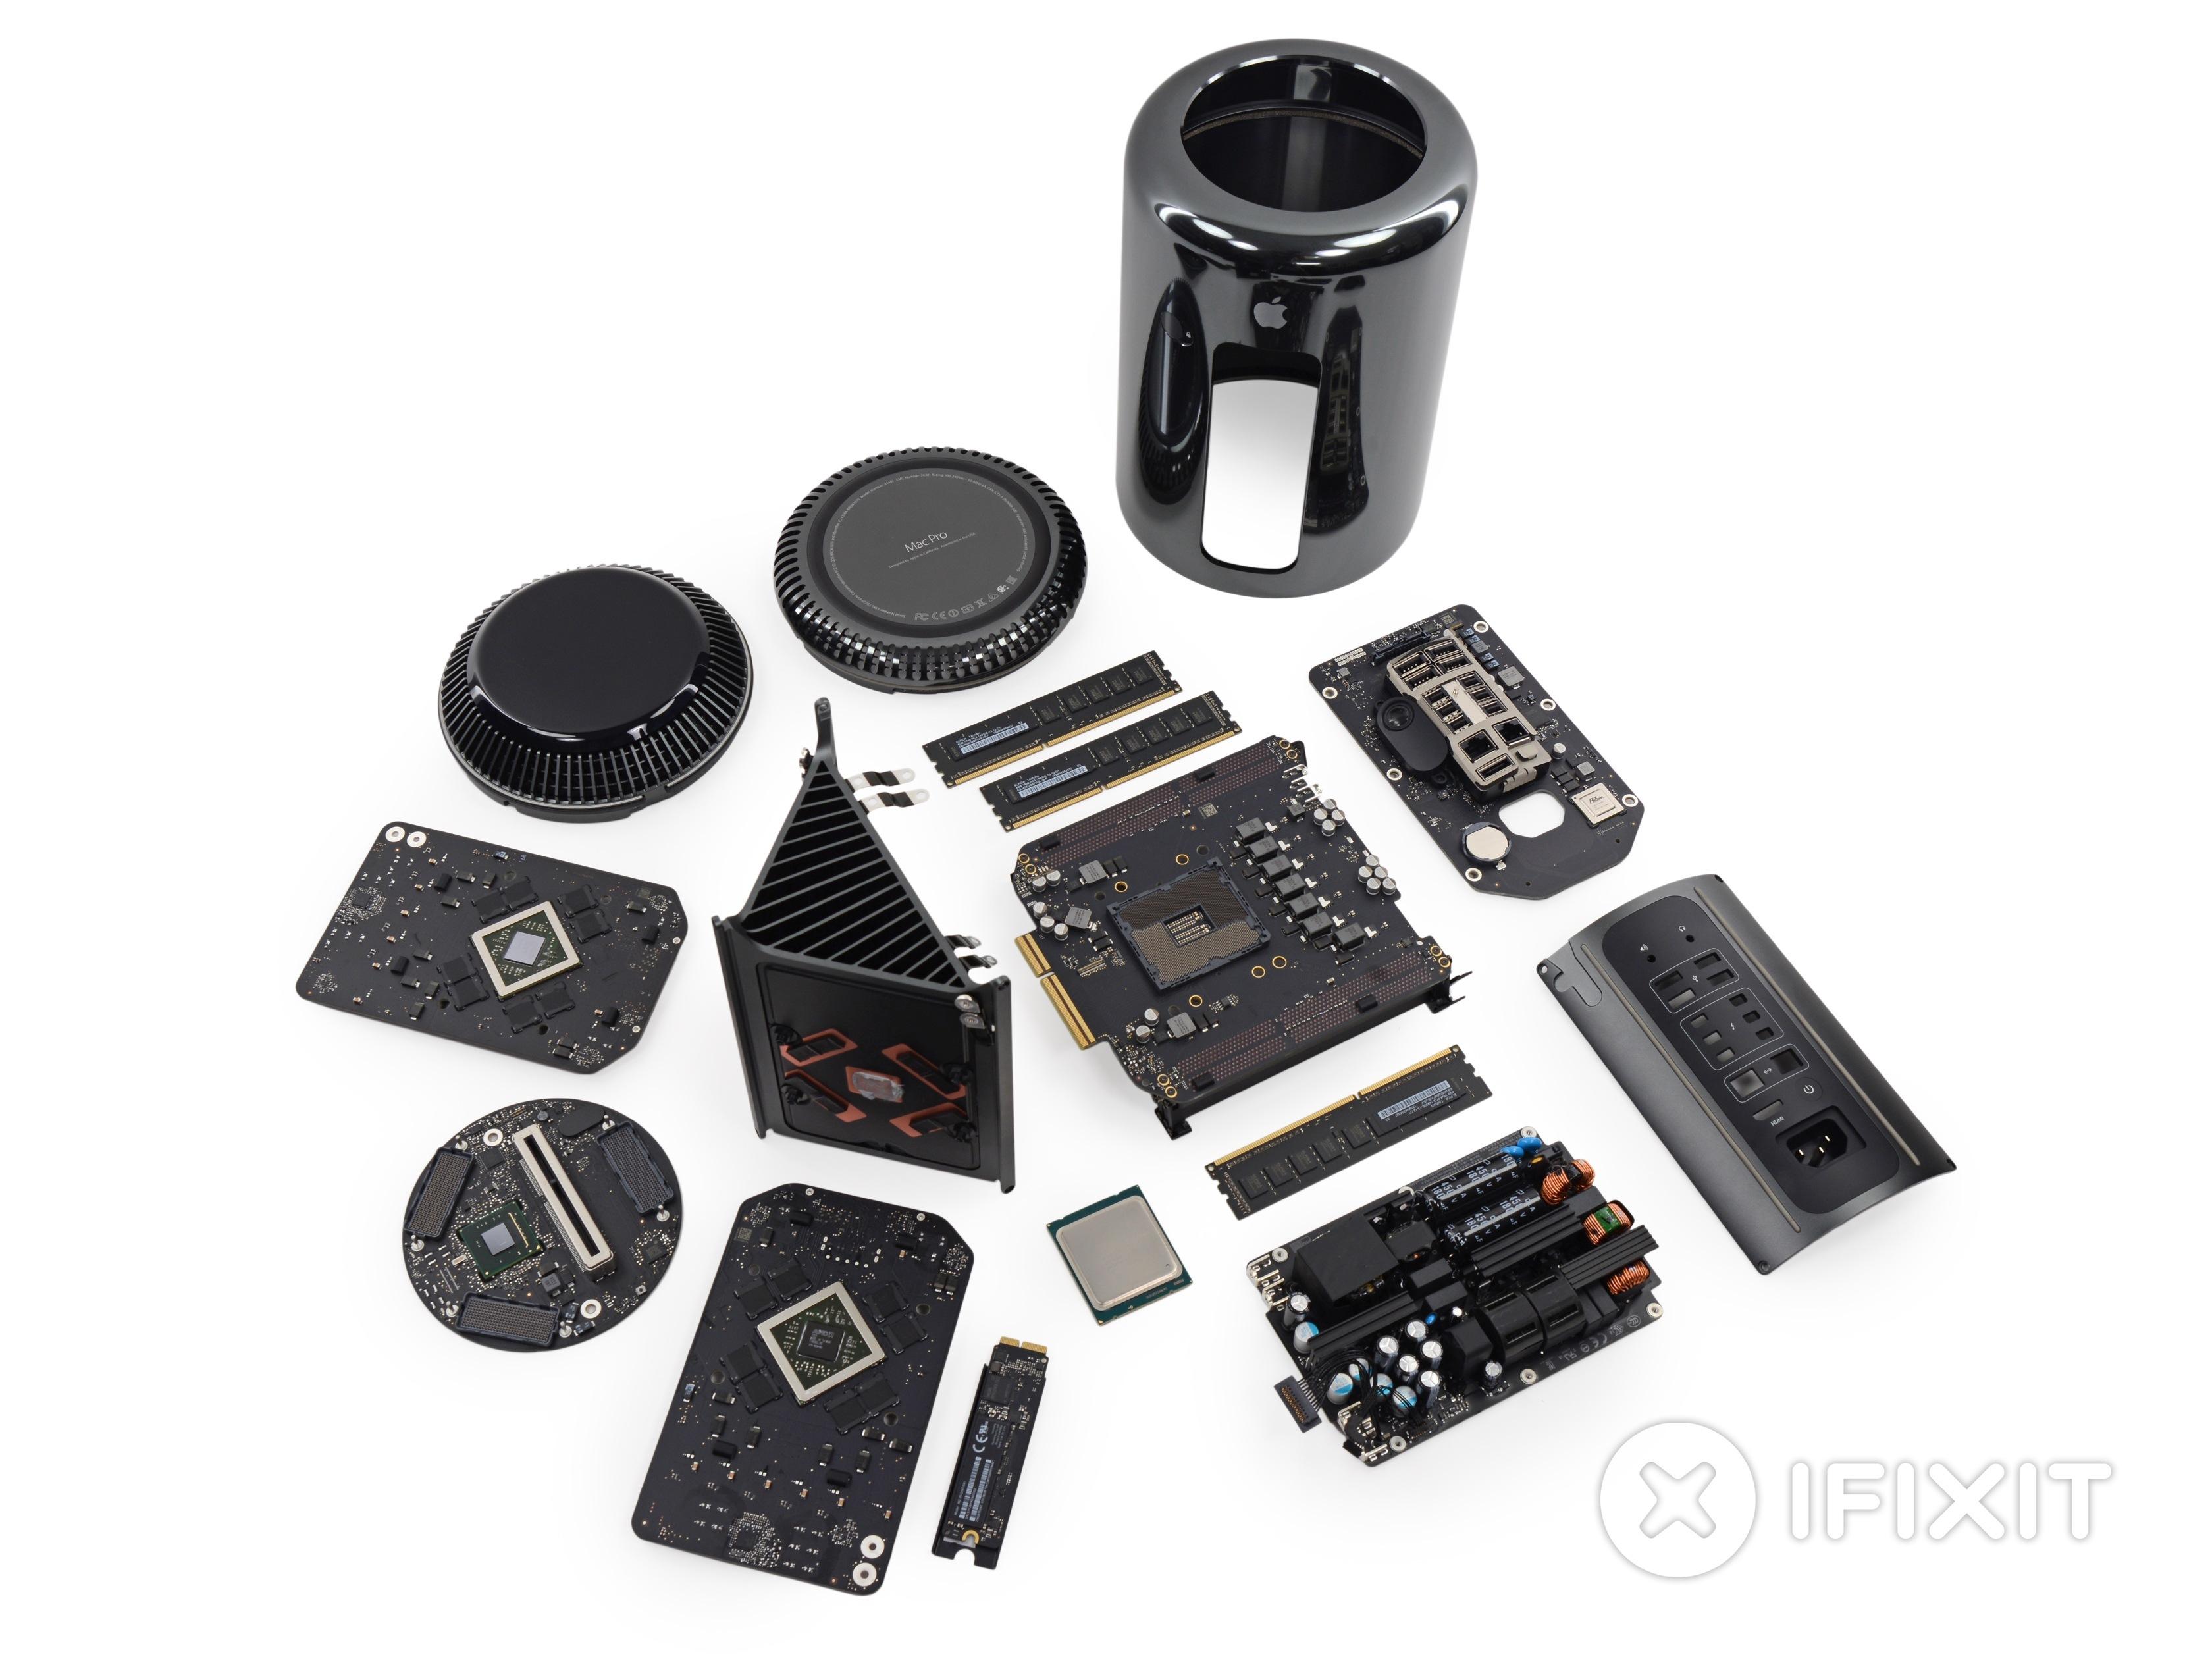 Mac Pro Late 2013 Teardown Ifixit Laptop Hard Drive On A Circuit Board Clock Awesome Combination